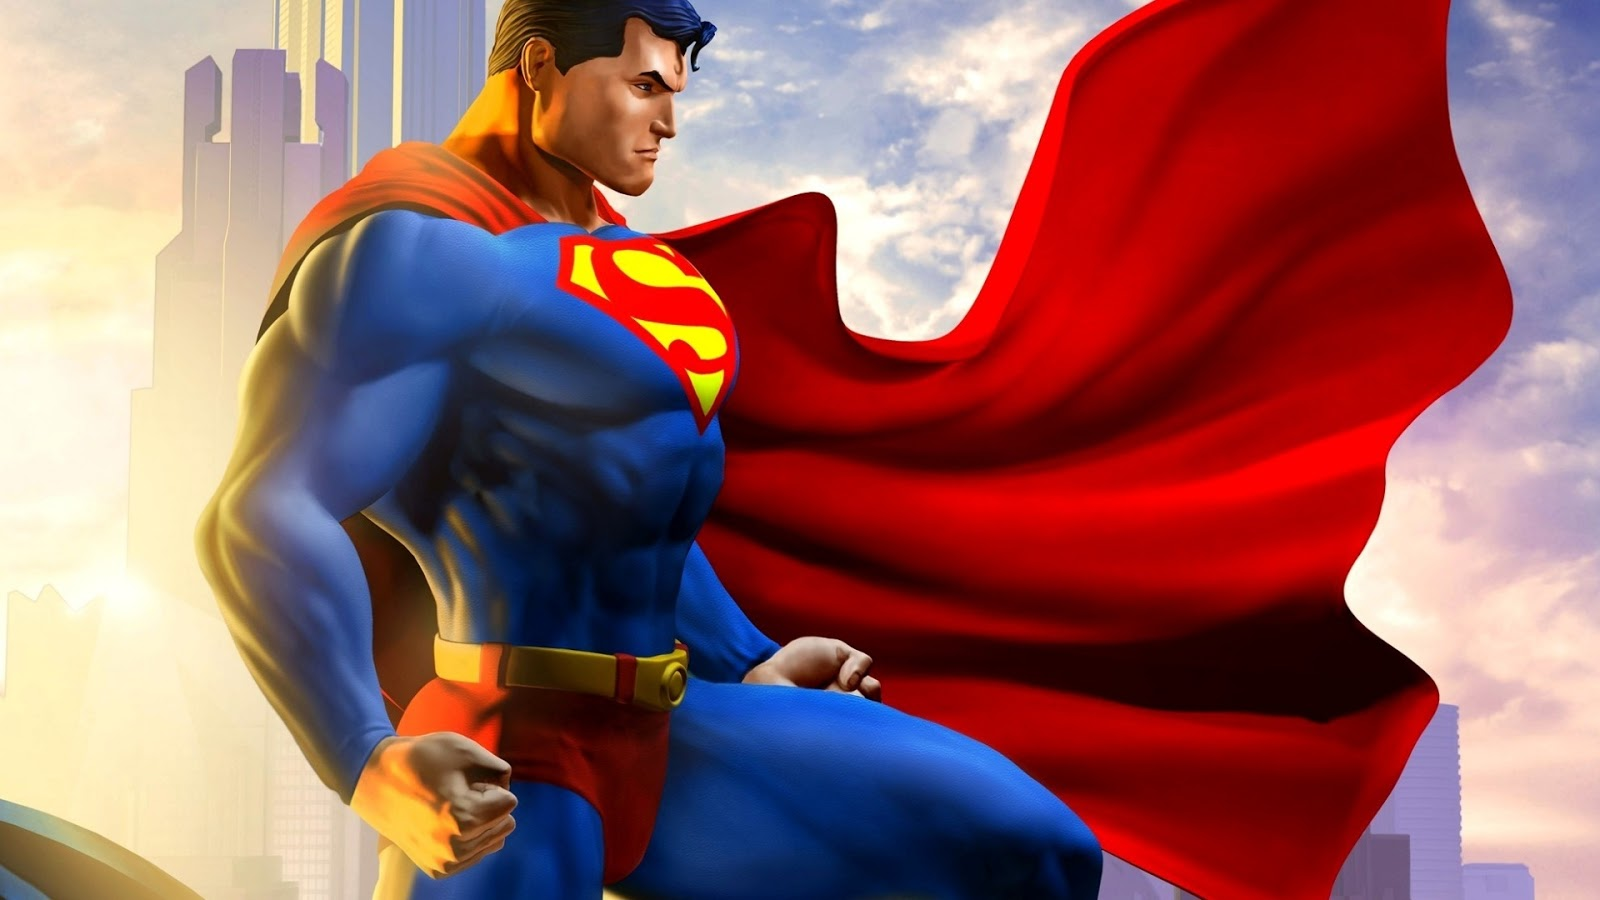 http://1.bp.blogspot.com/_Gq1jO6iuU2U/TS40lgPavEI/AAAAAAAAHbk/kydOihGwzmM/s1600/man+of+steal+superman-wallpaper+hd.jpg